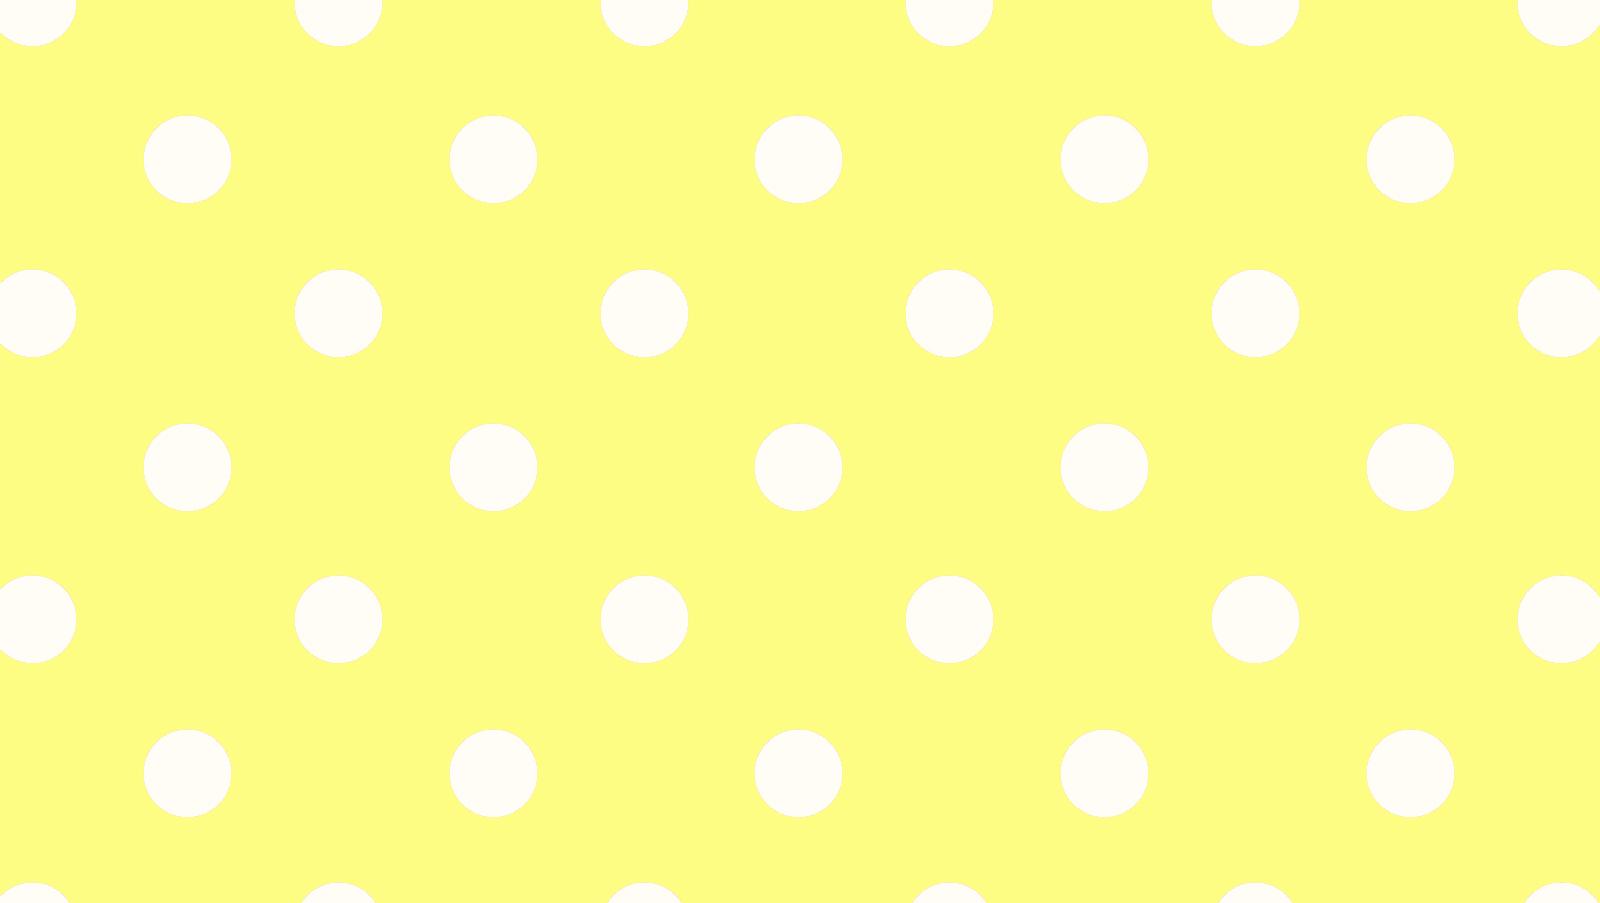 Yellow polka dot wallpaper wallpapersafari for Polka dot wallpaper